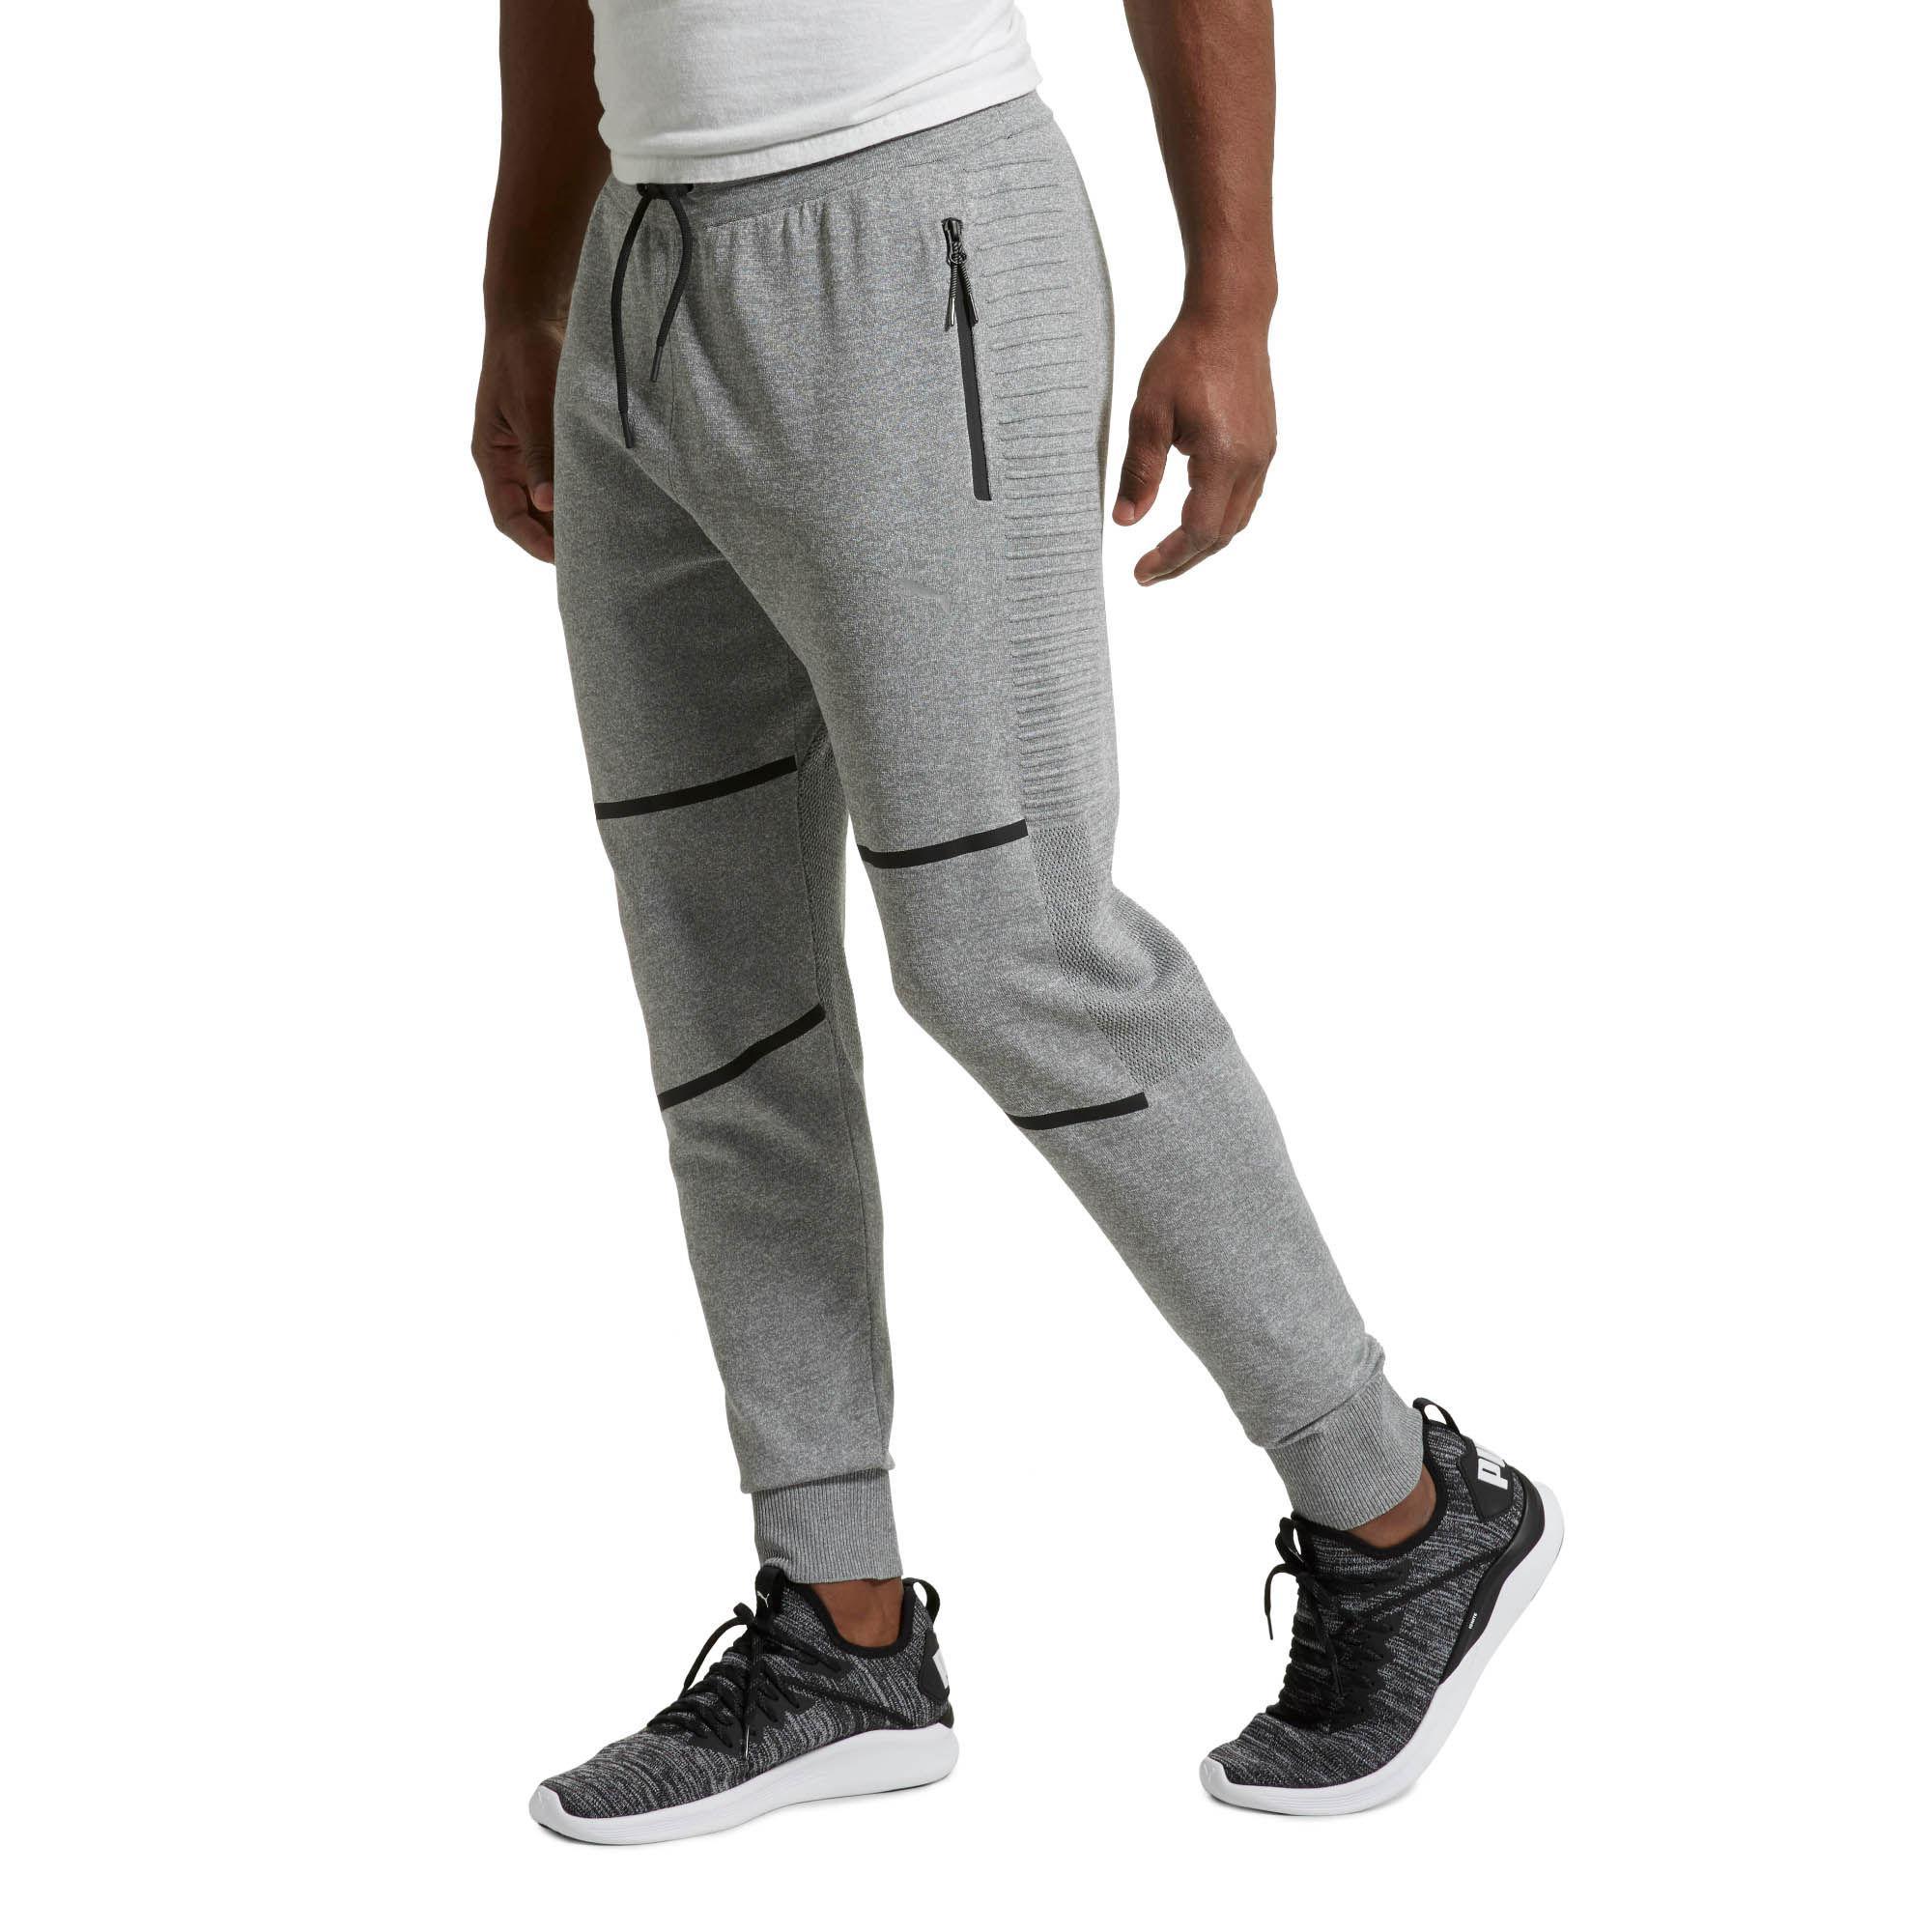 86097c455de2 PUMA - Gray Evoknit Men s Energy Trackster Pants for Men - Lyst. View  fullscreen